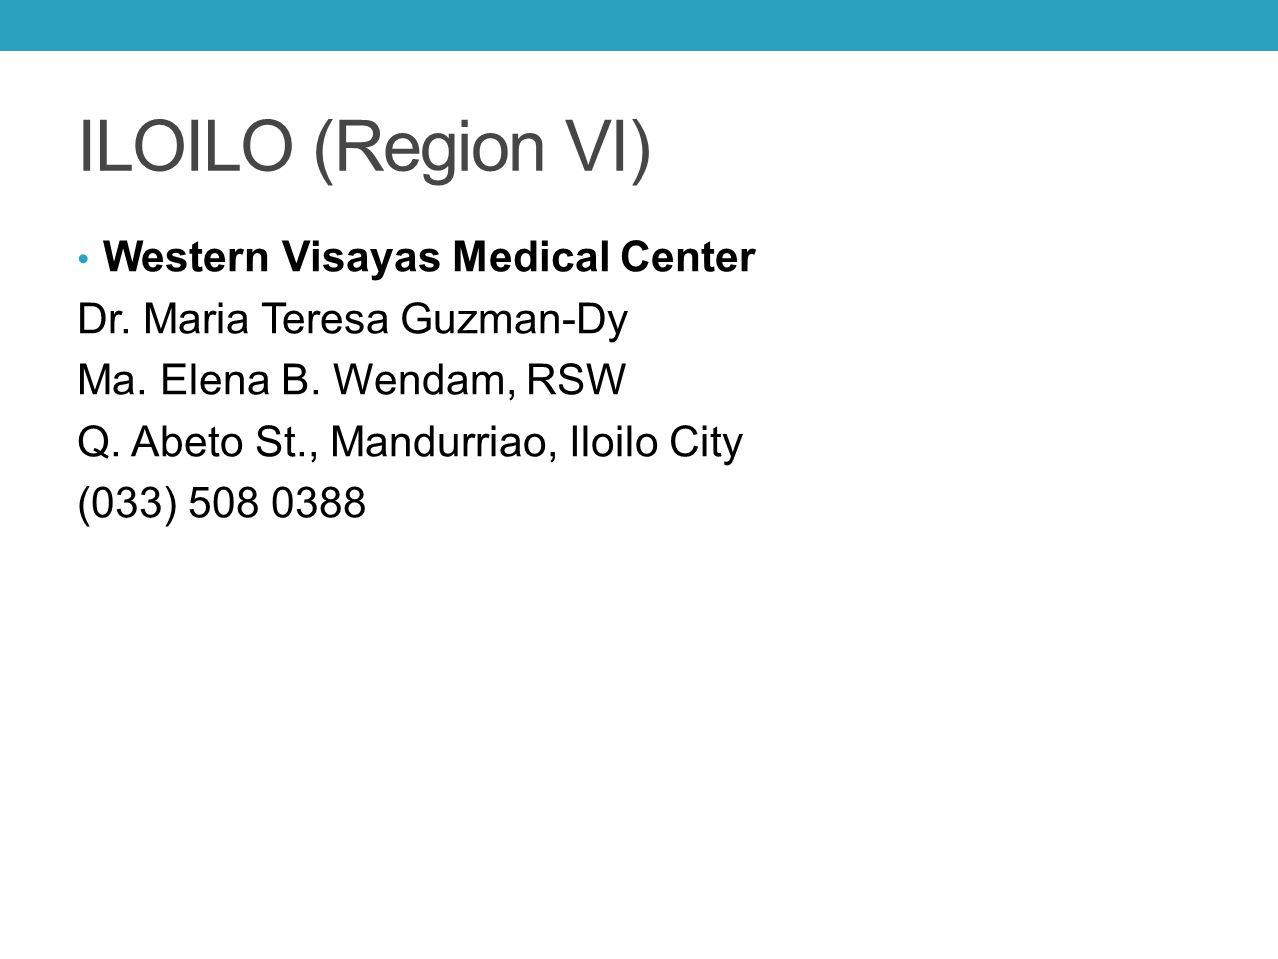 ILOILO (Region VI) Western Visayas Medical Center Dr. Maria Teresa Guzman-Dy Ma. Elena B. Wendam, RSW Q. Abeto St., Mandurriao, Iloilo City (033) 508